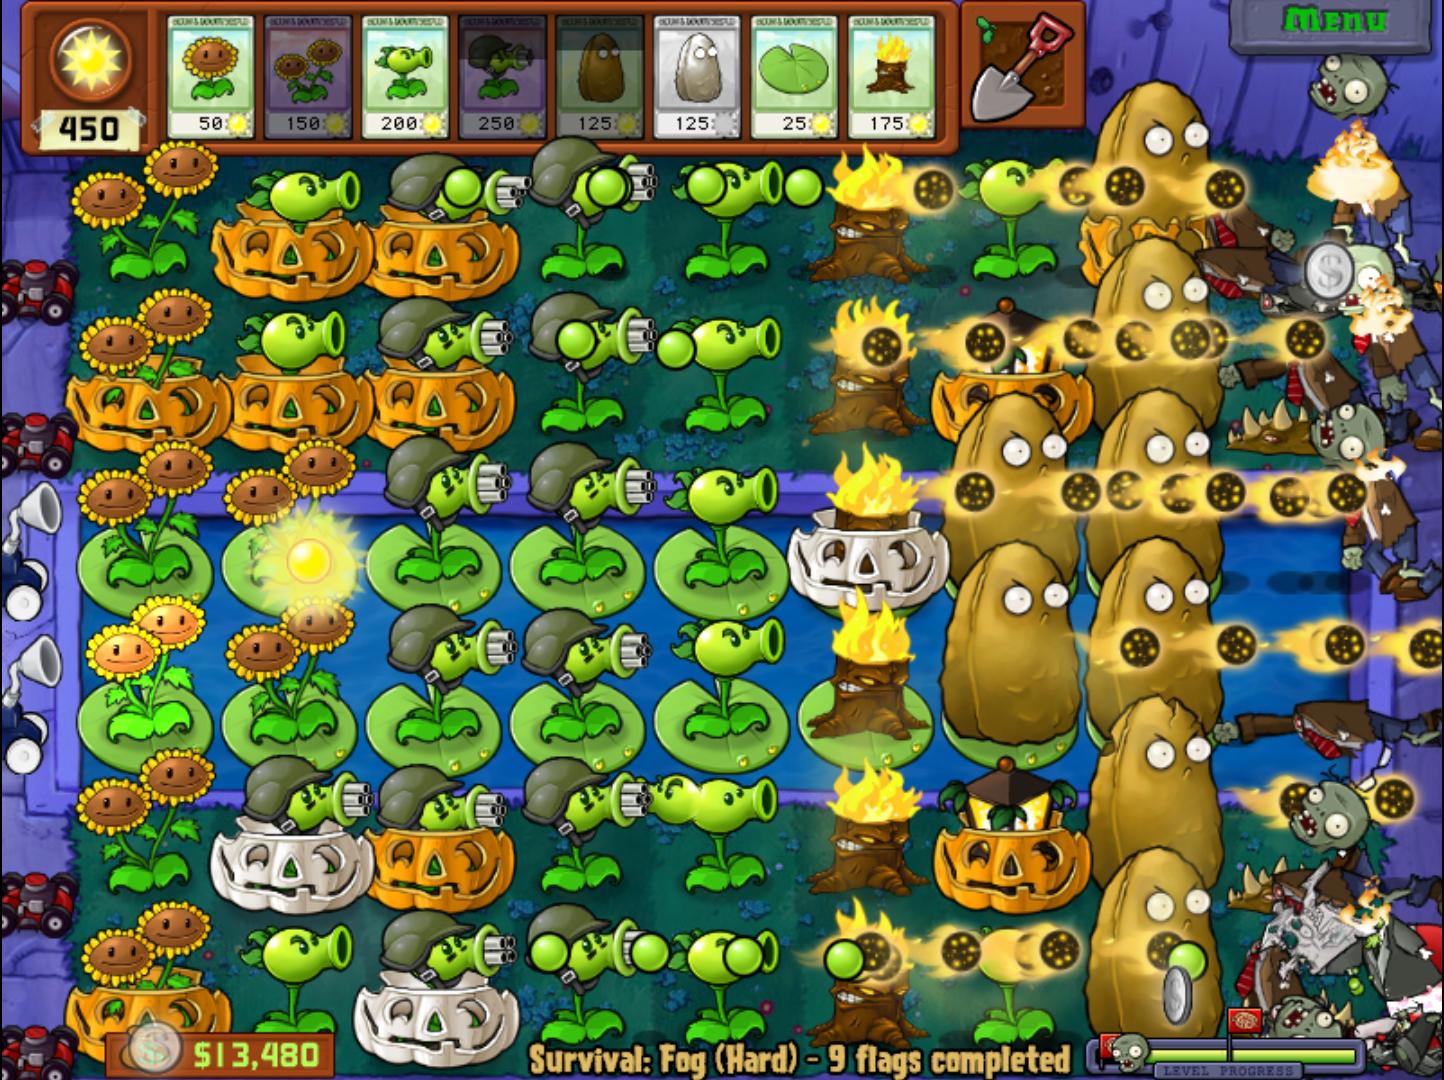 plantas vs zumbis eu amo ser gamer